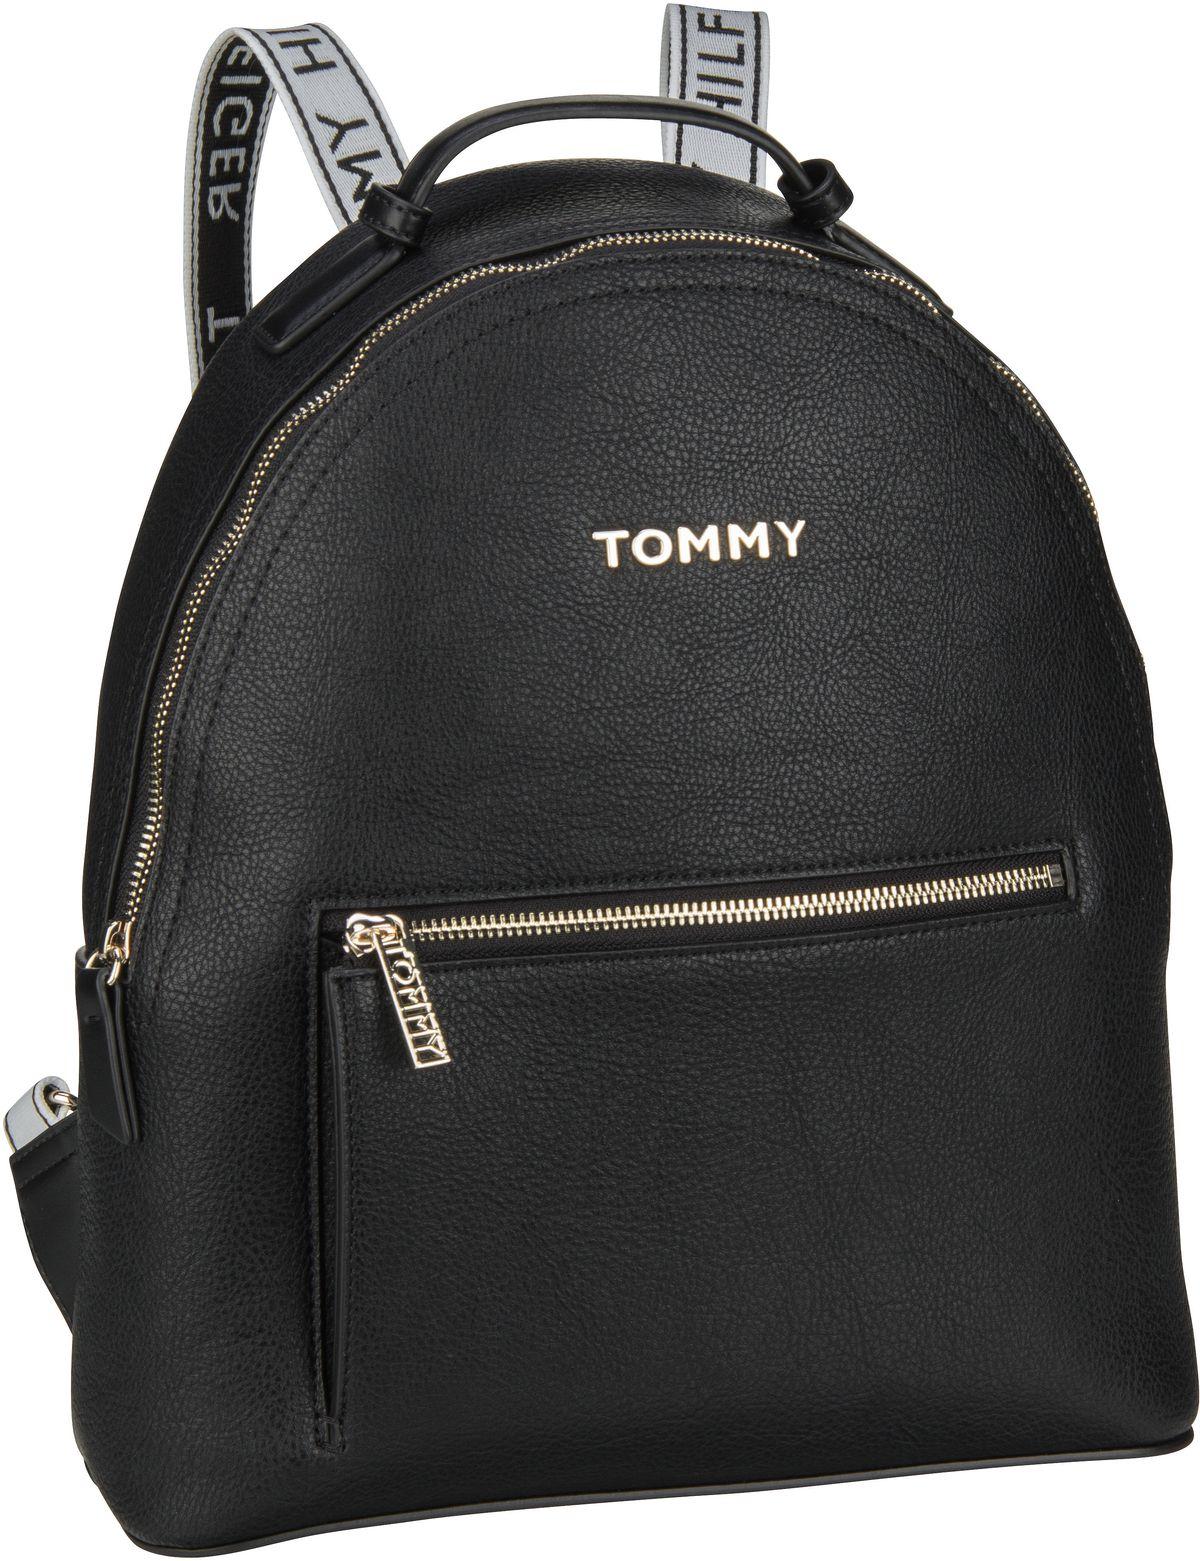 Rucksack / Daypack Iconic Tommy Backpack PSP20 Black